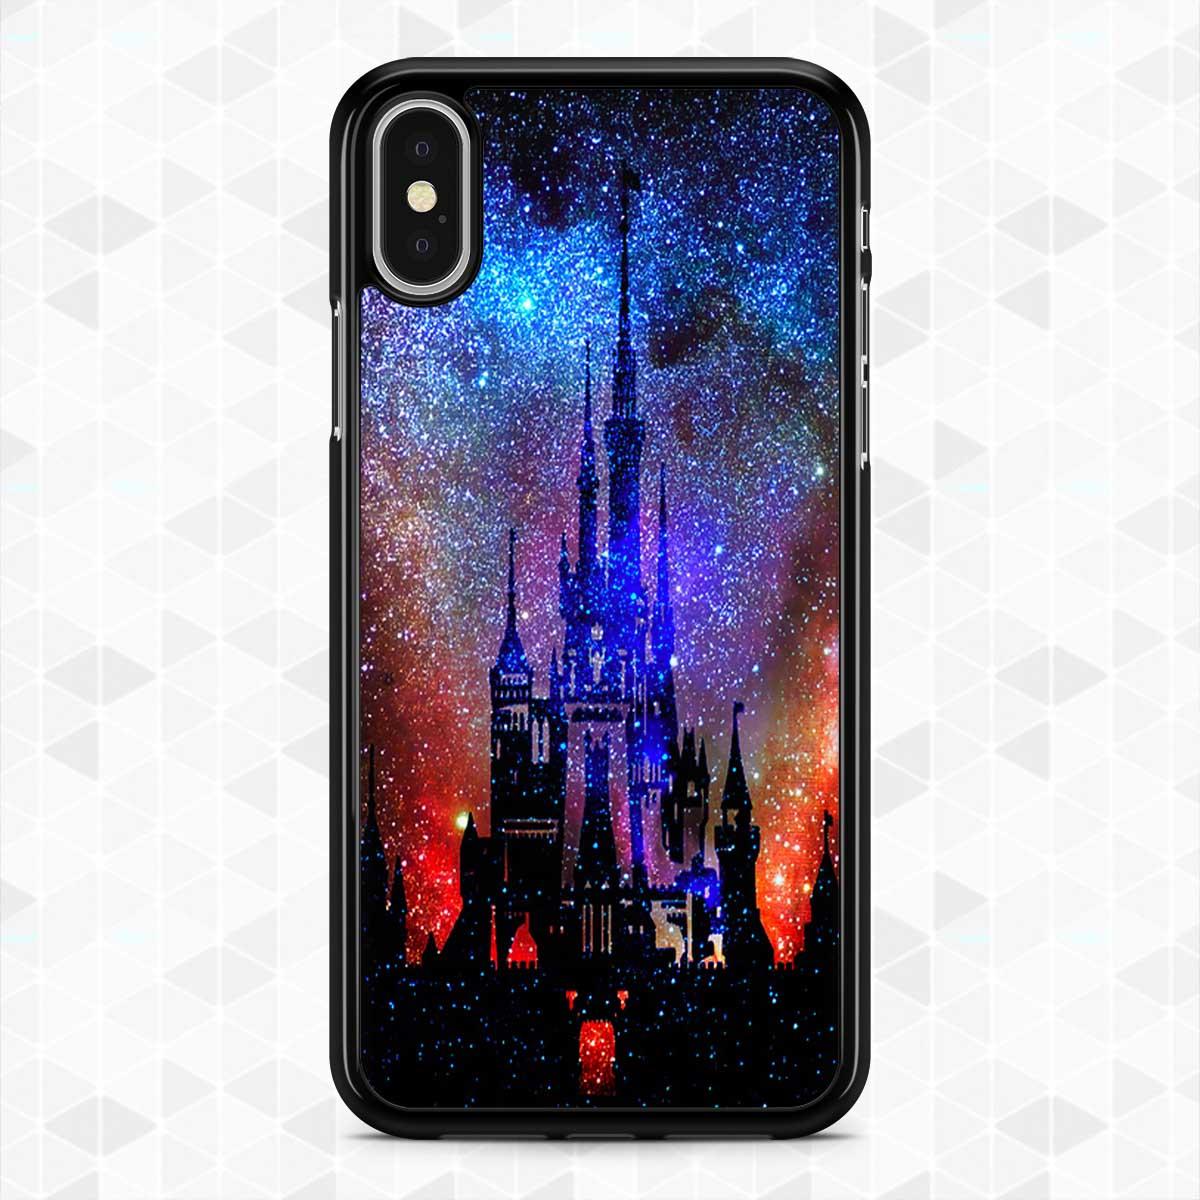 new concept dca13 2f5a4 Best!Disney!Castle7598 Phone Case iPhone XS Max X 8 Plus 7+ XR 6s+ Case  Samsung S9+ S9 S8+ S8 Note 9 8 5 Cases